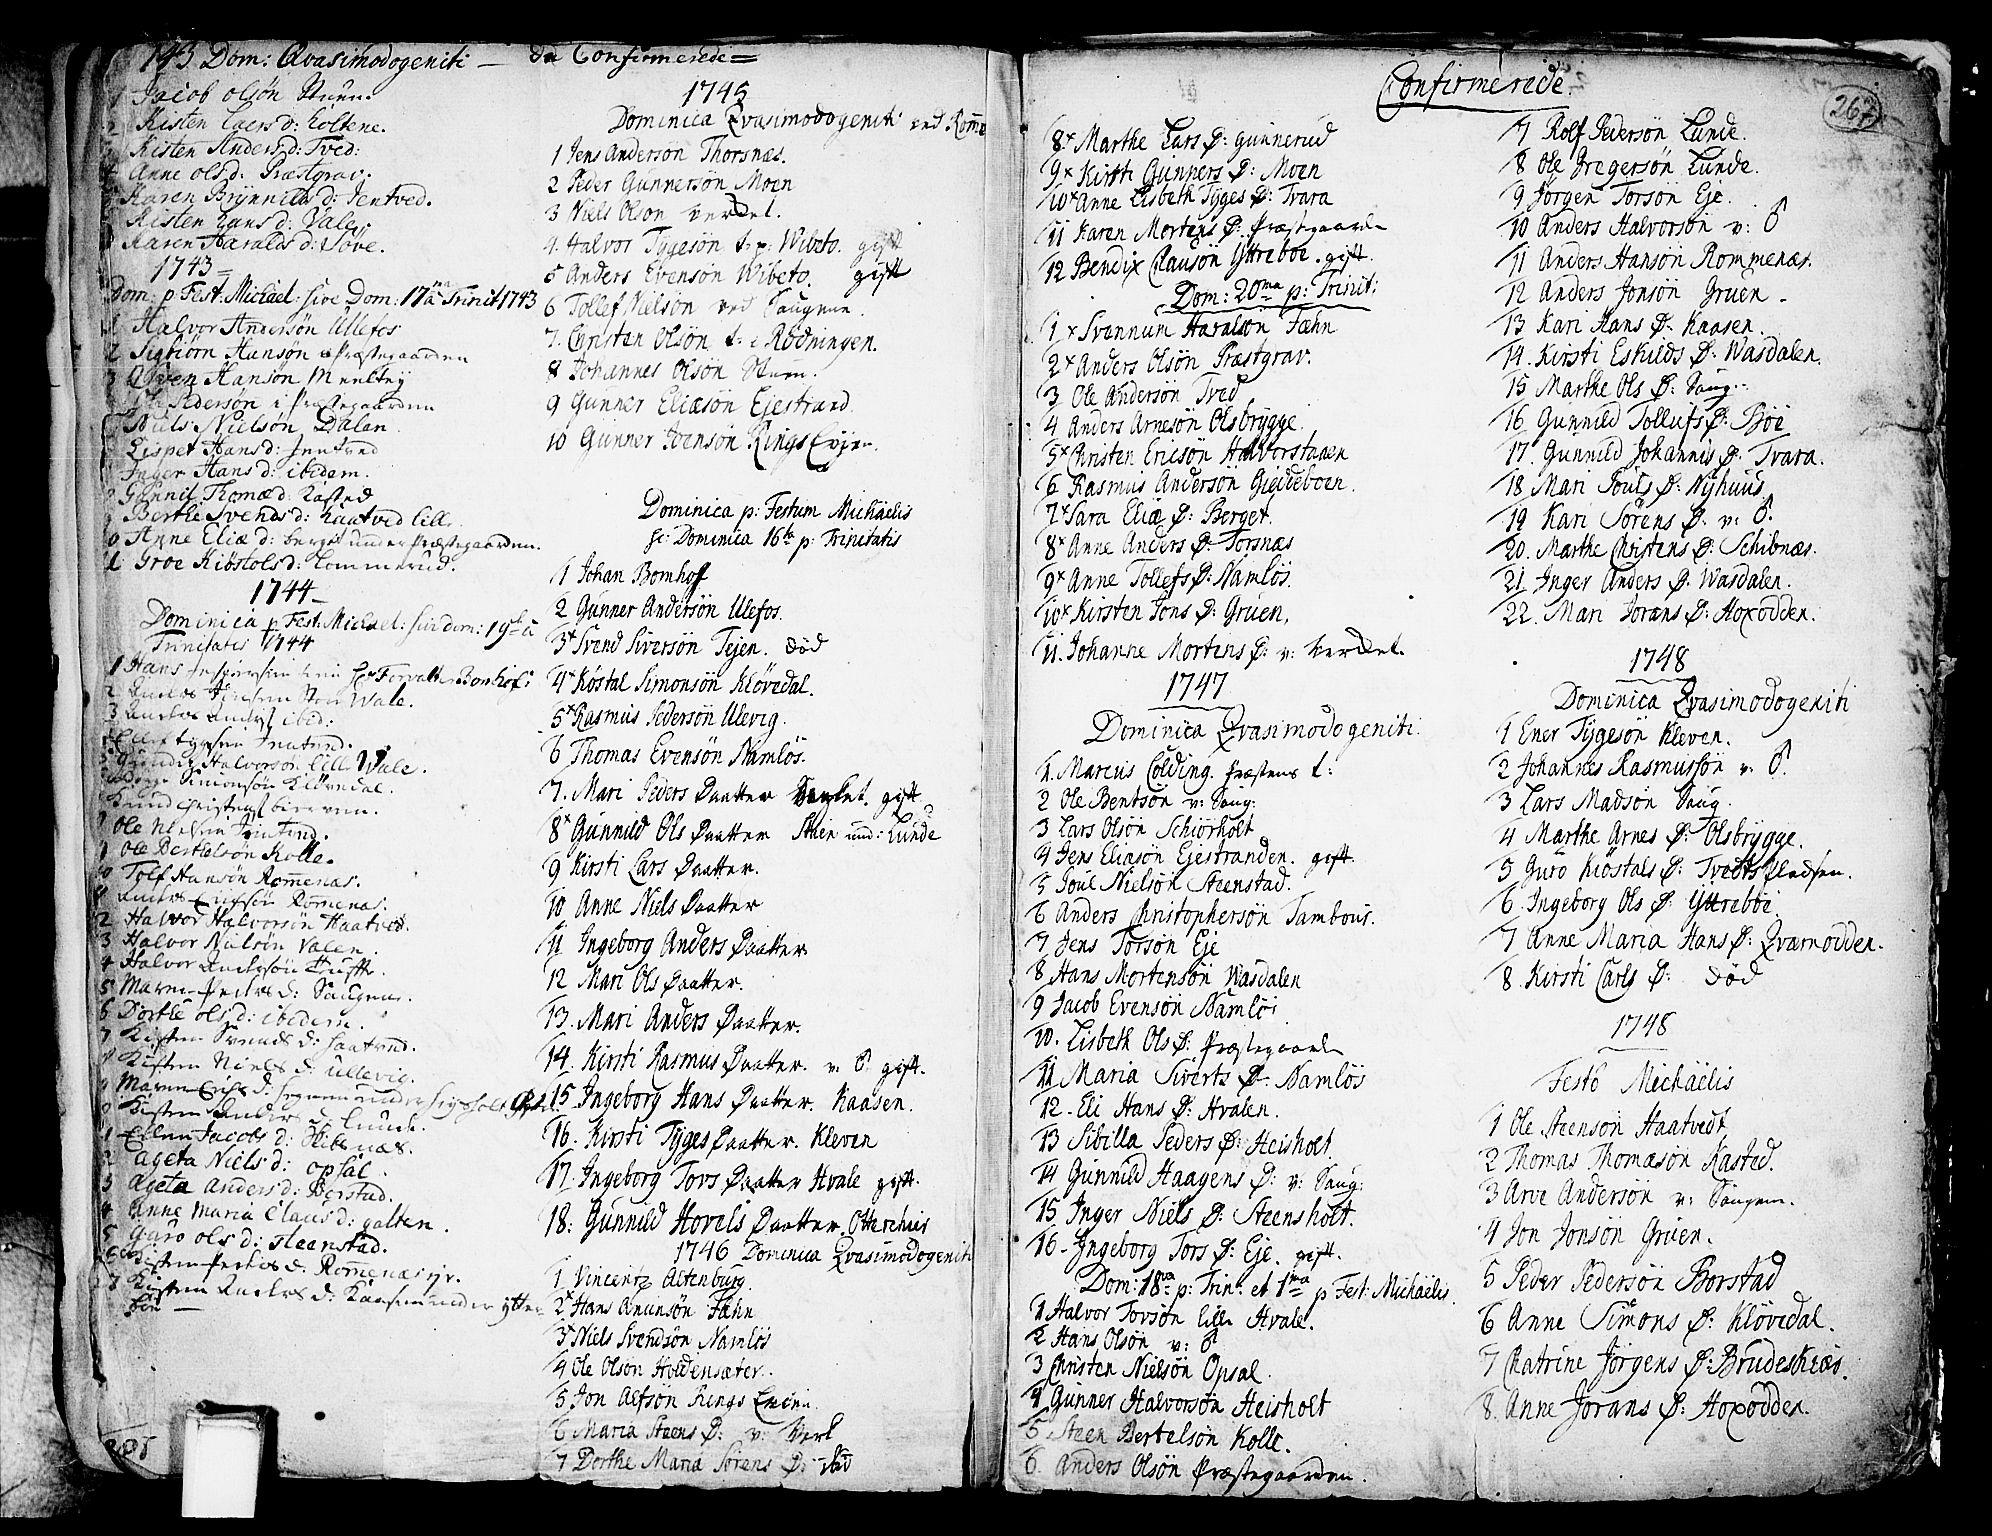 SAKO, Holla kirkebøker, F/Fa/L0001: Ministerialbok nr. 1, 1717-1779, s. 267